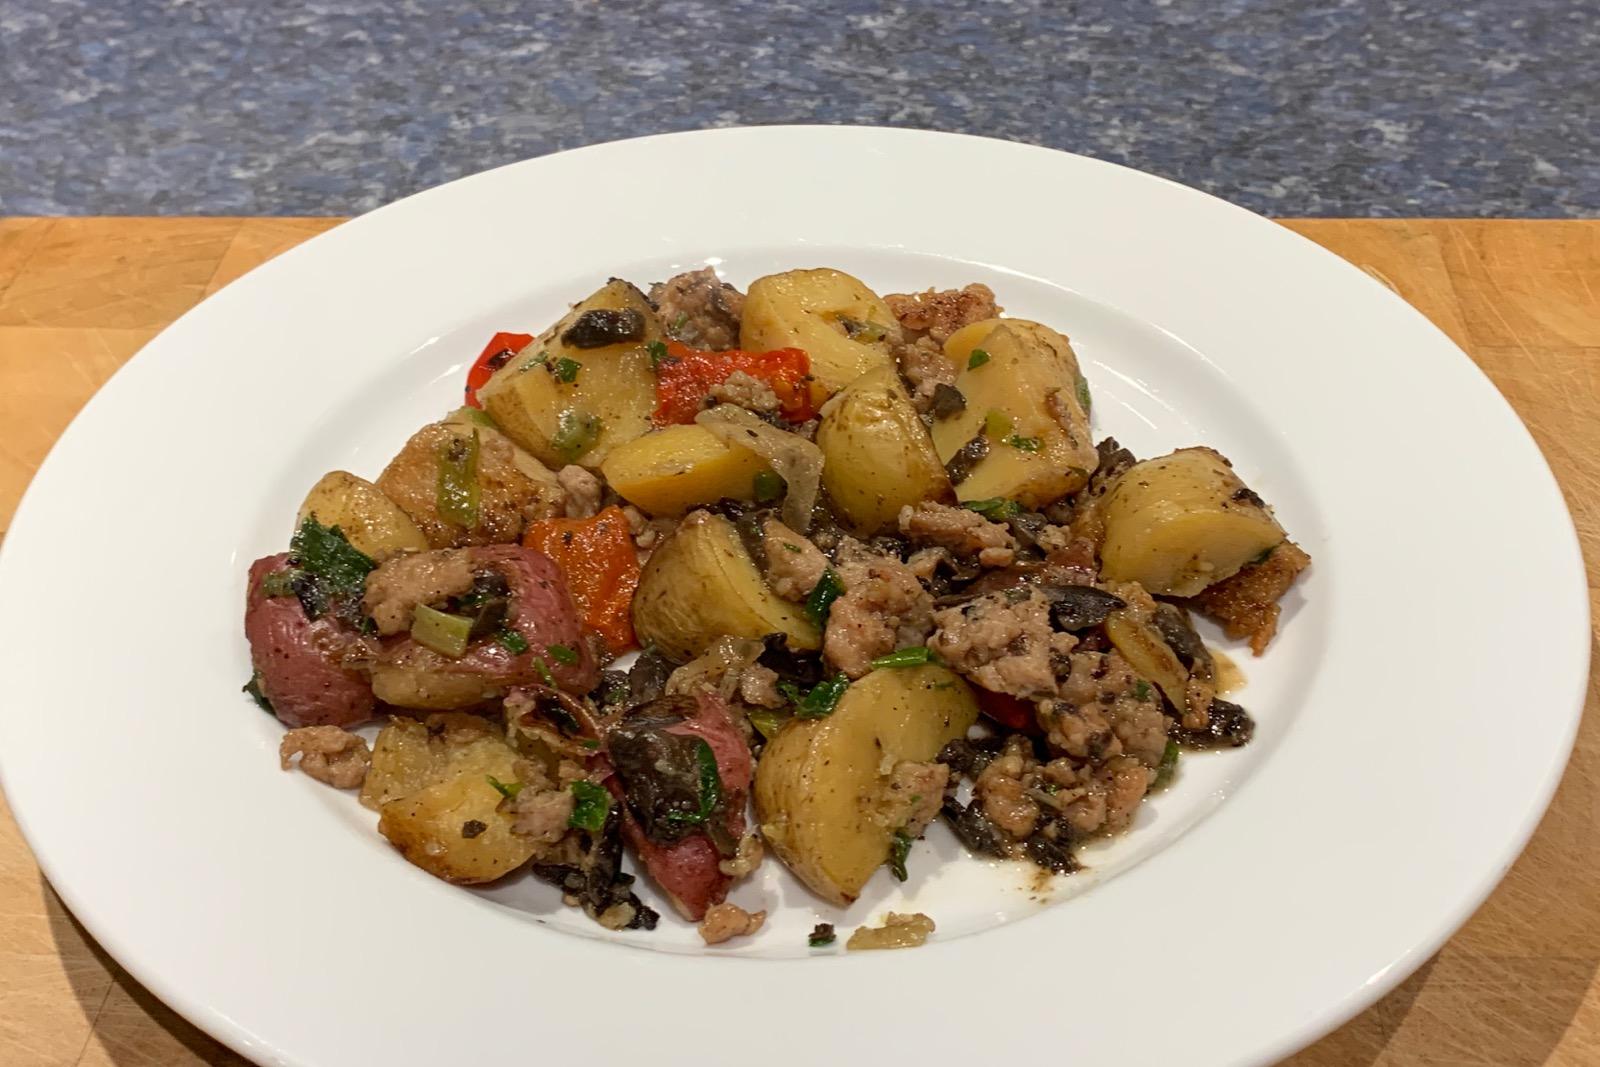 http://blog.rickk.com/food/2020/10/03/ate.2020.10.03.b.jpg